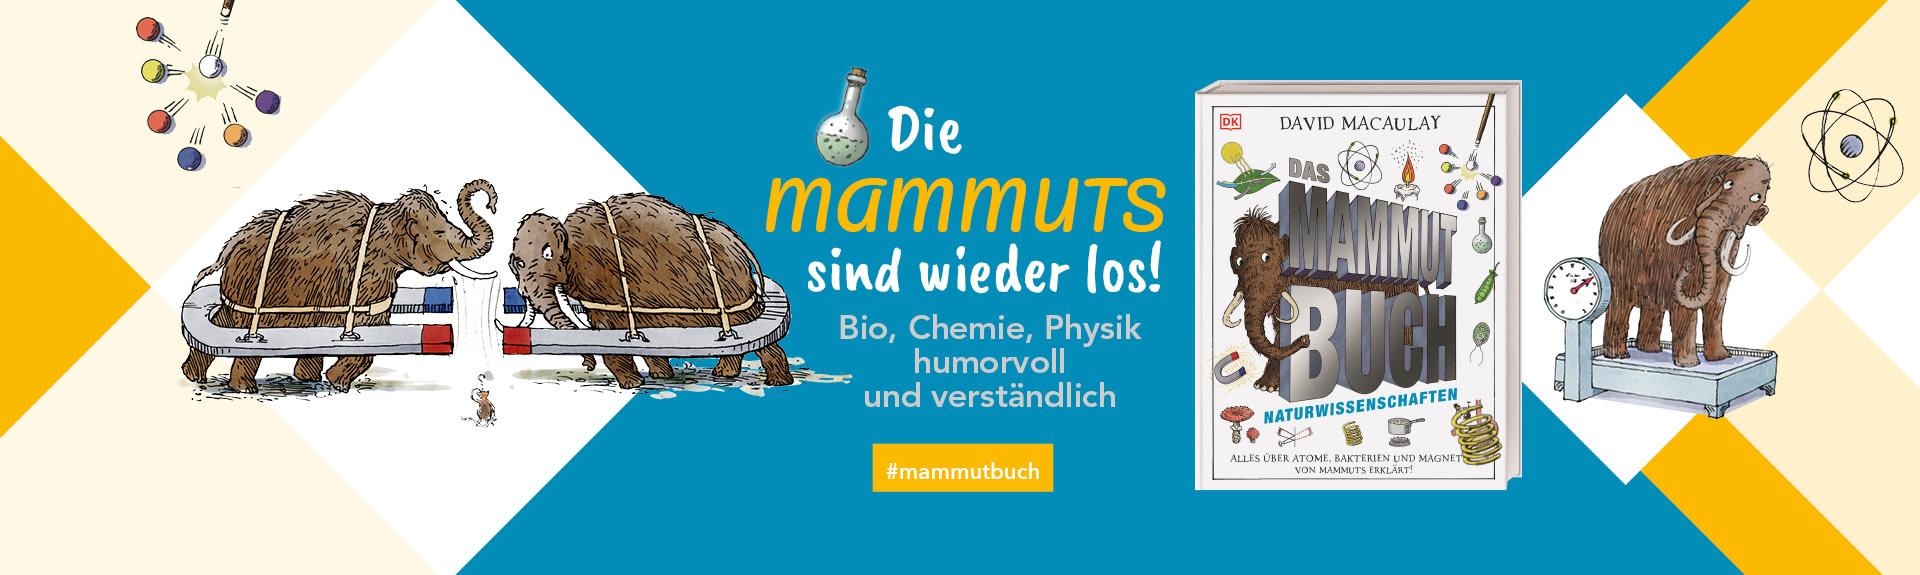 FJ21 - Mammutbuch der Naturwissenschaften